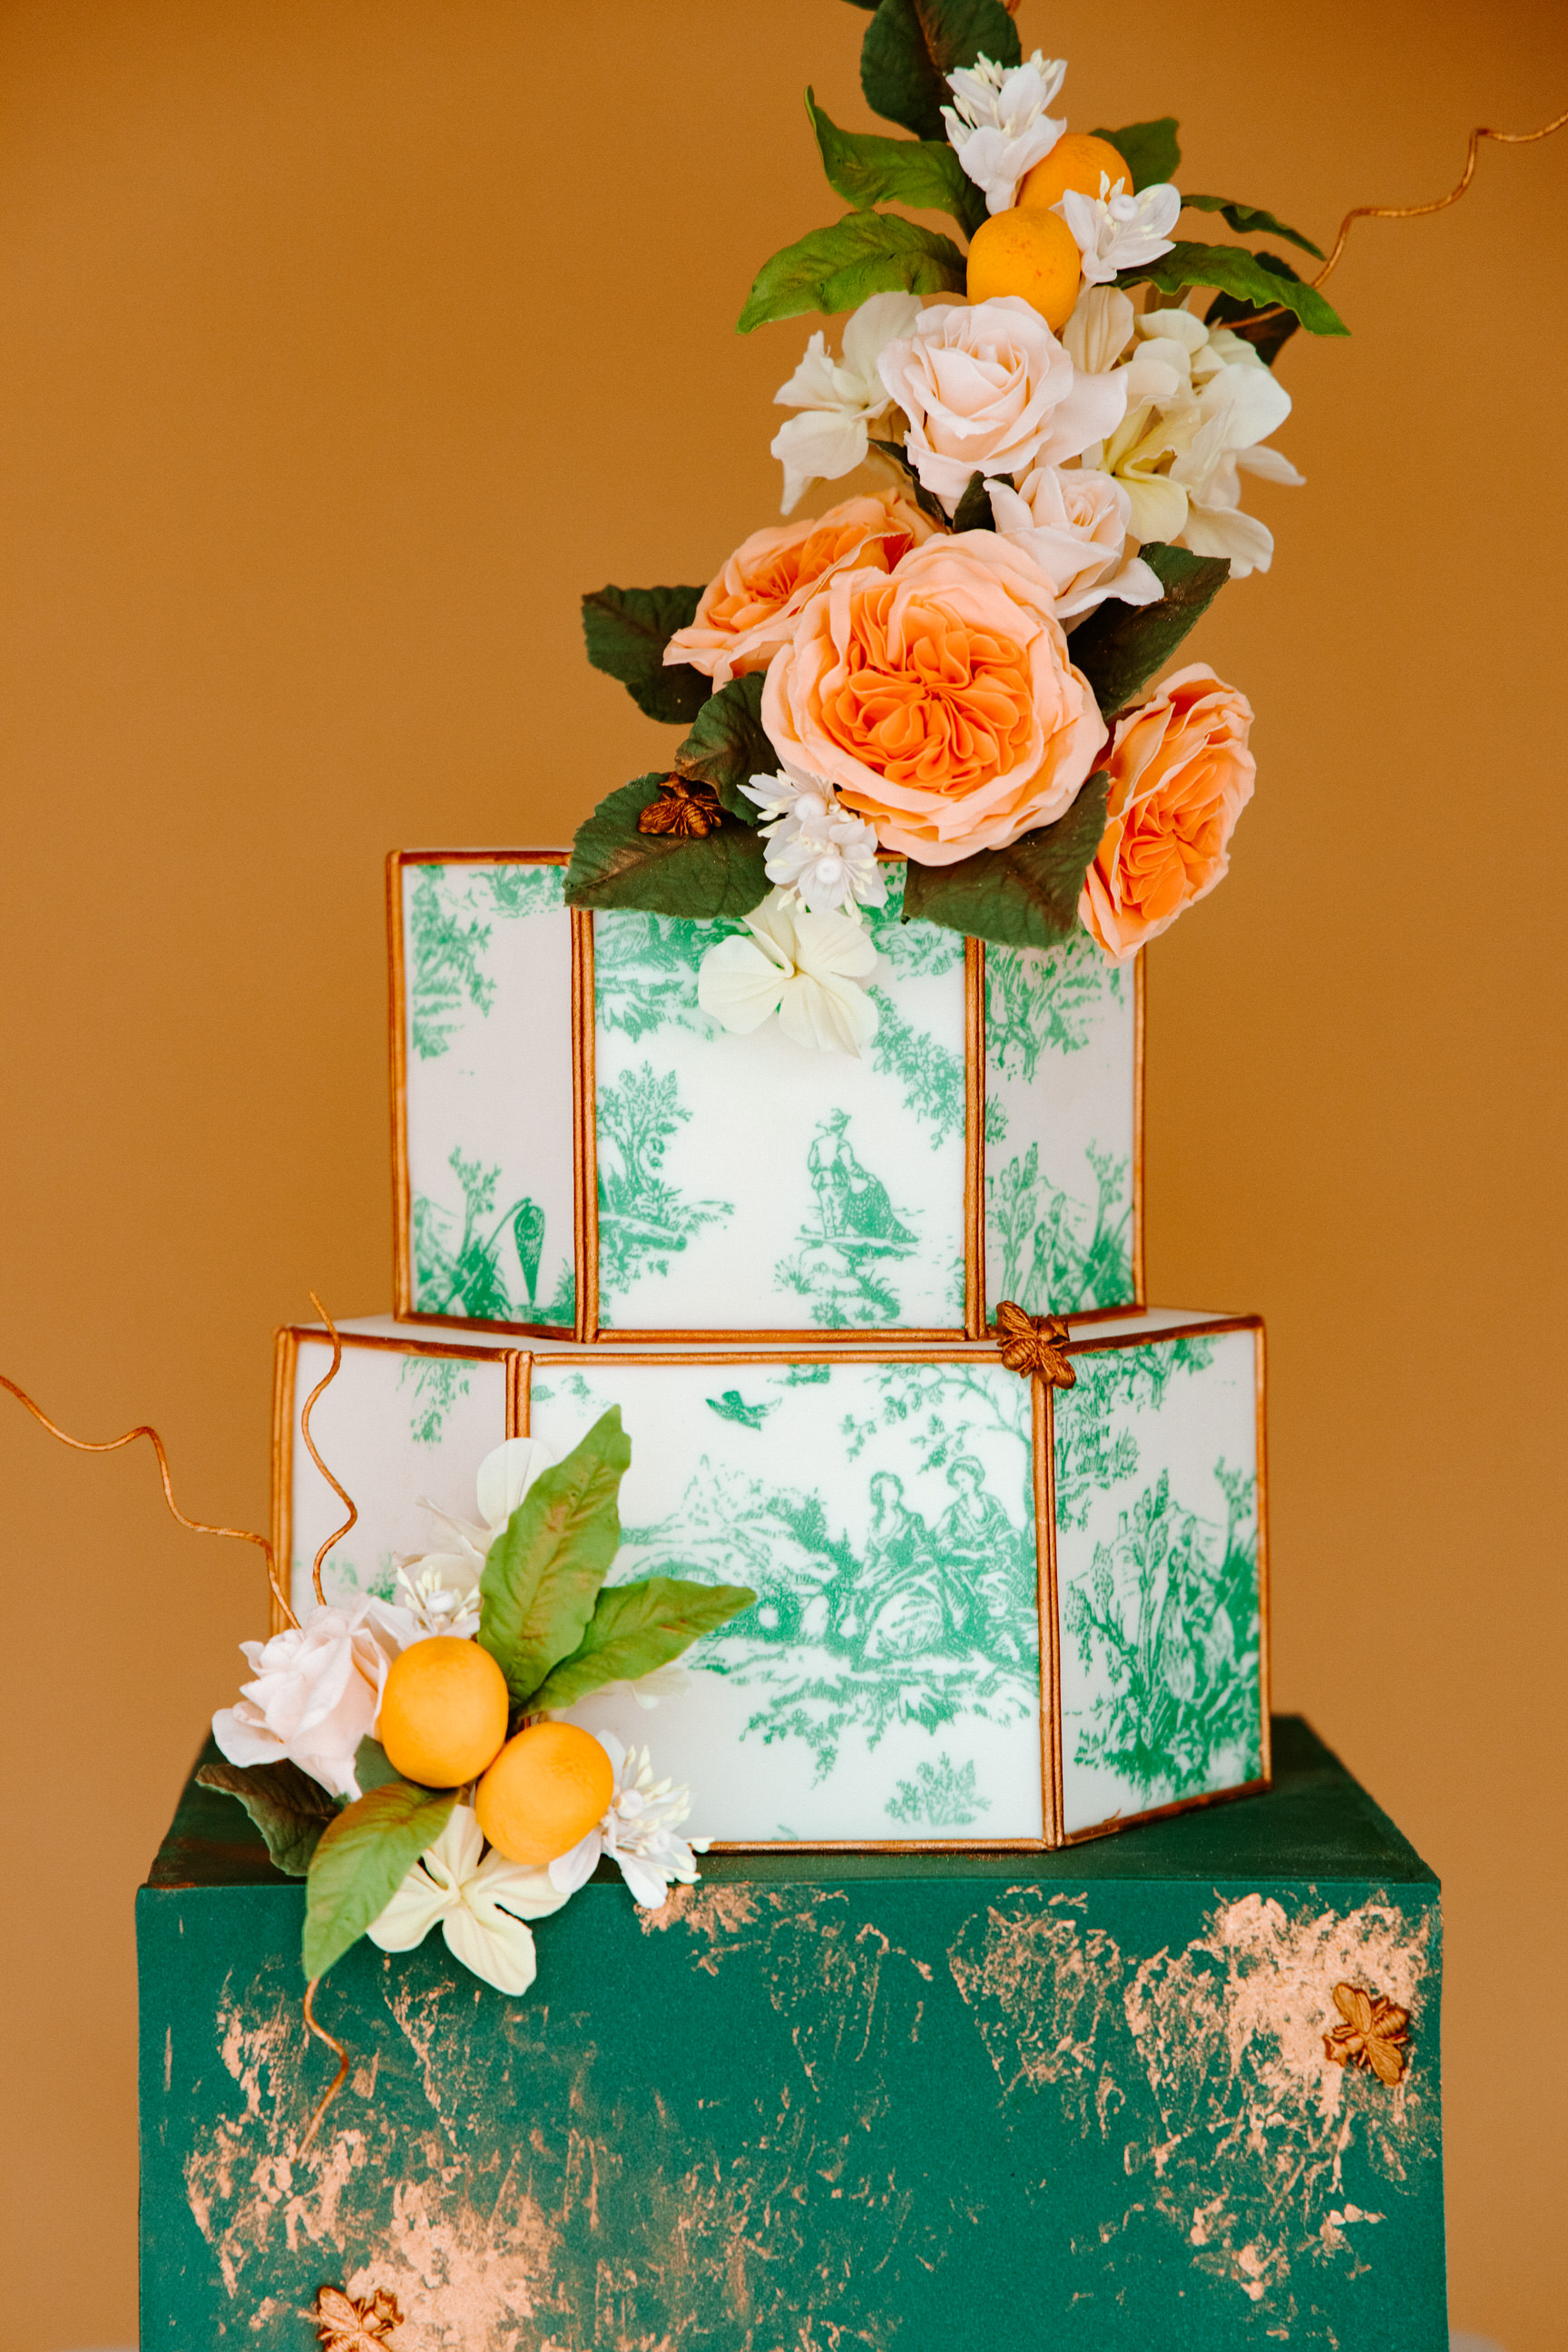 gateaux-cake-7393.jpg